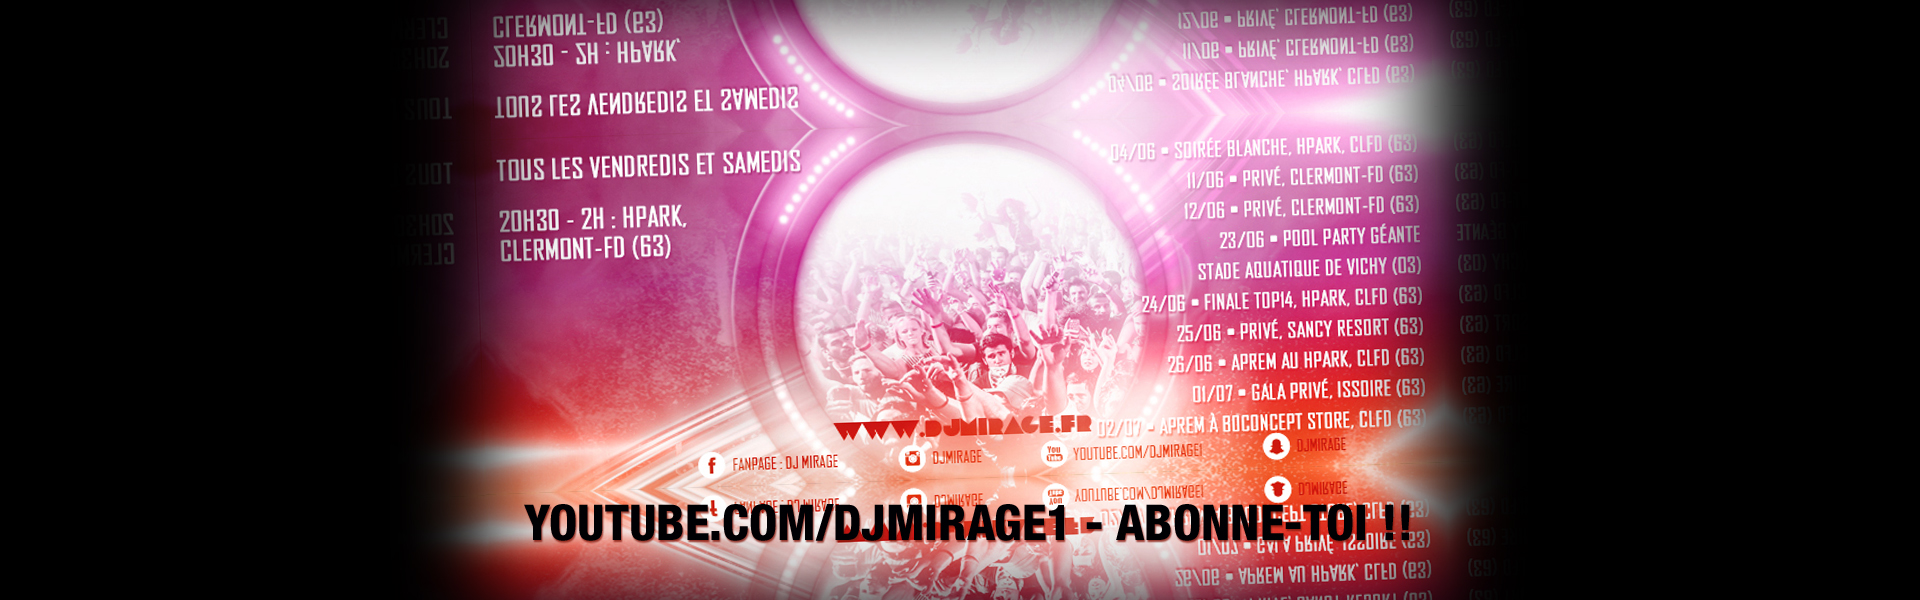 http://djmirage.fr/wp-content/uploads/2016/10/slider-accueil-deejaymirage-juin16.jpg